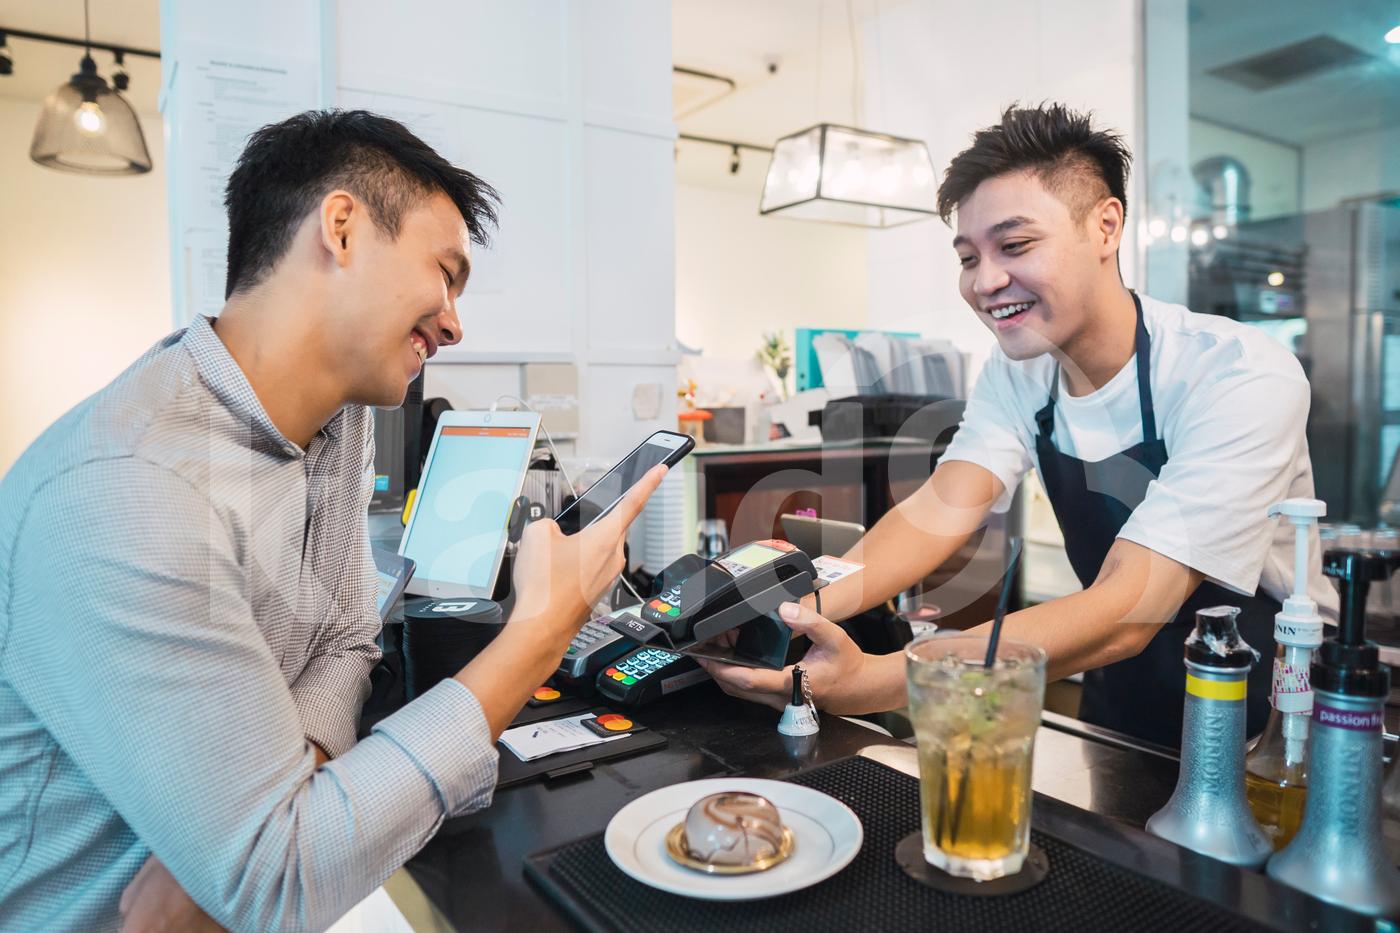 Asian man scanning QR code to make payment